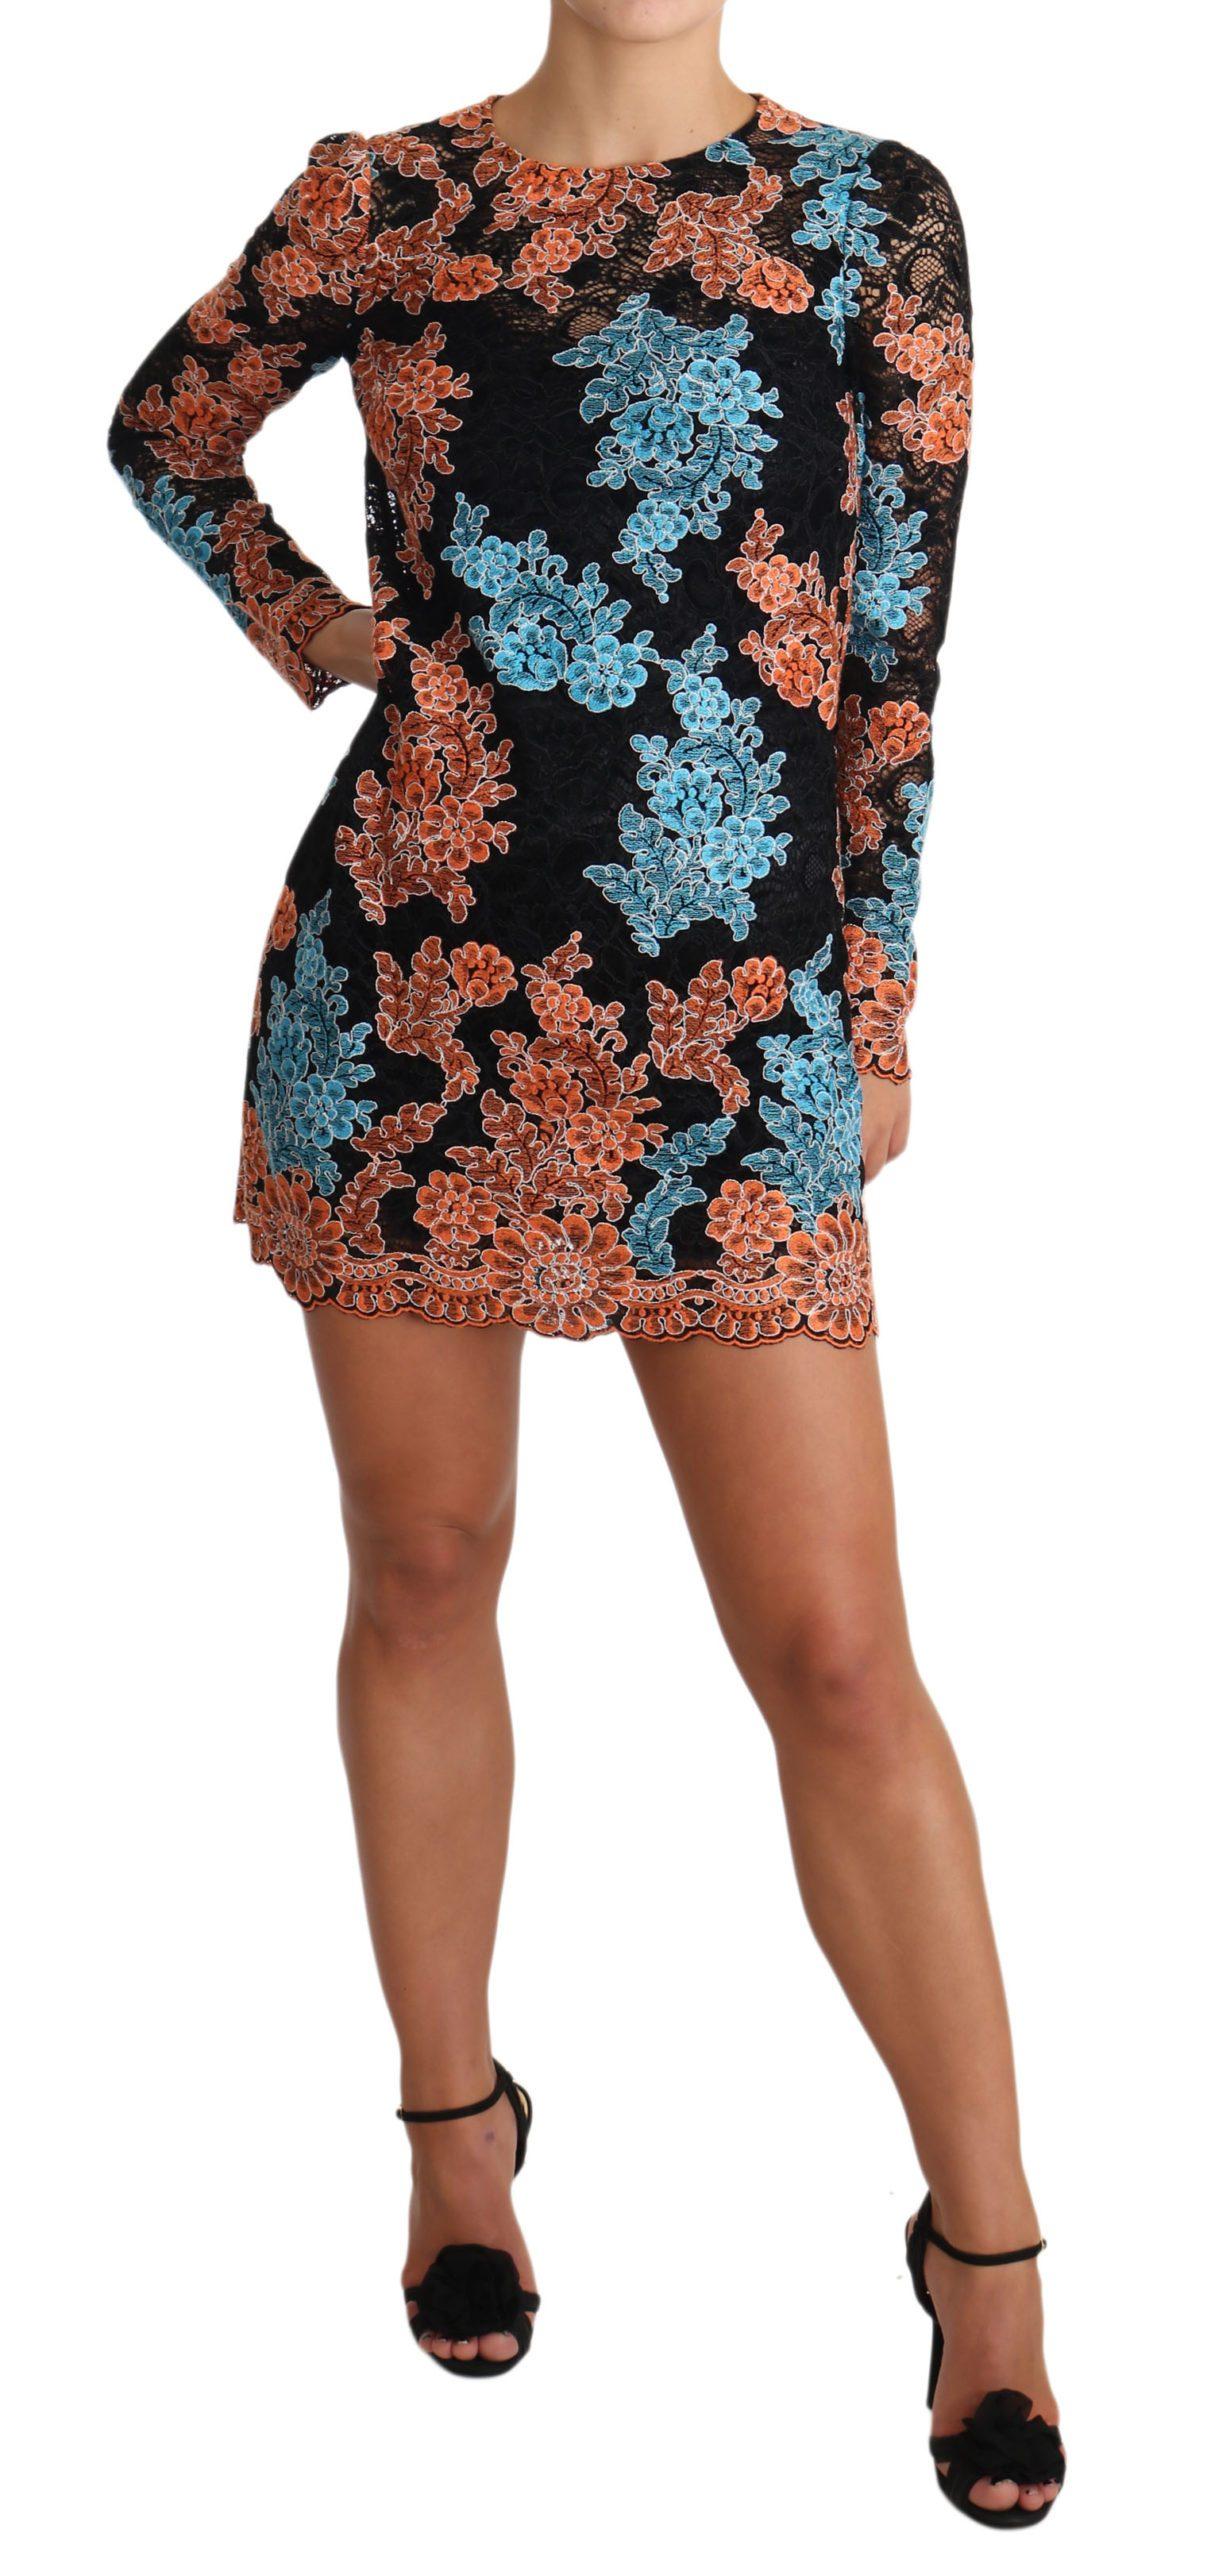 Dolce & Gabbana Women's Lace Embroidered Mini Dress Black DR1943 - IT38|XS